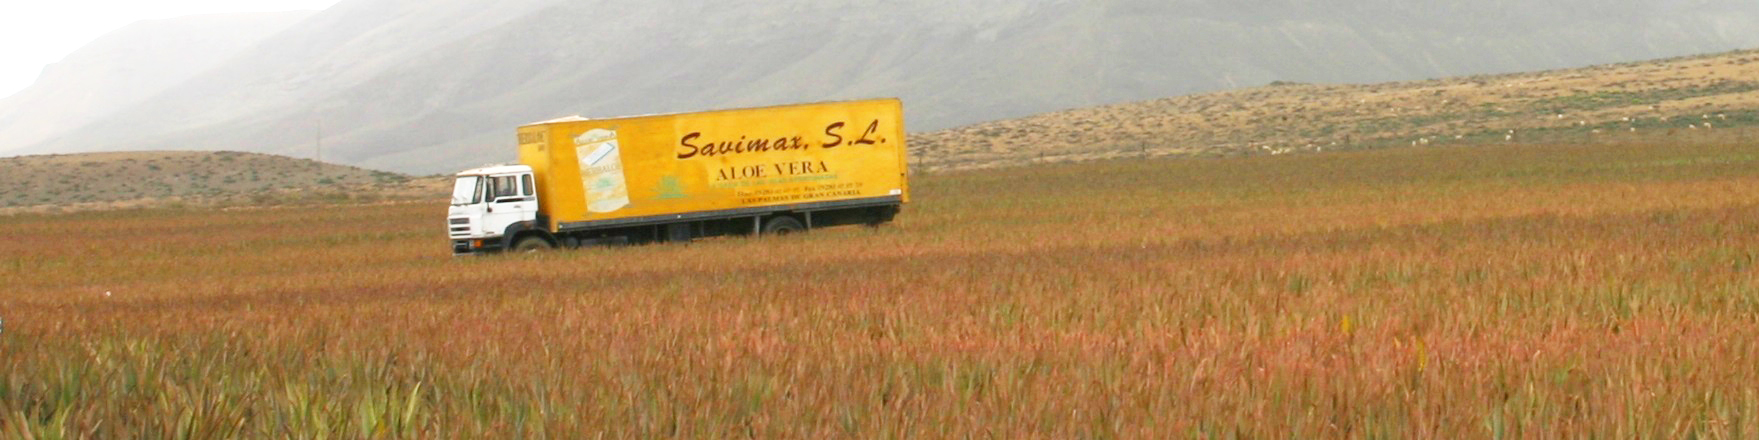 Savimax-1